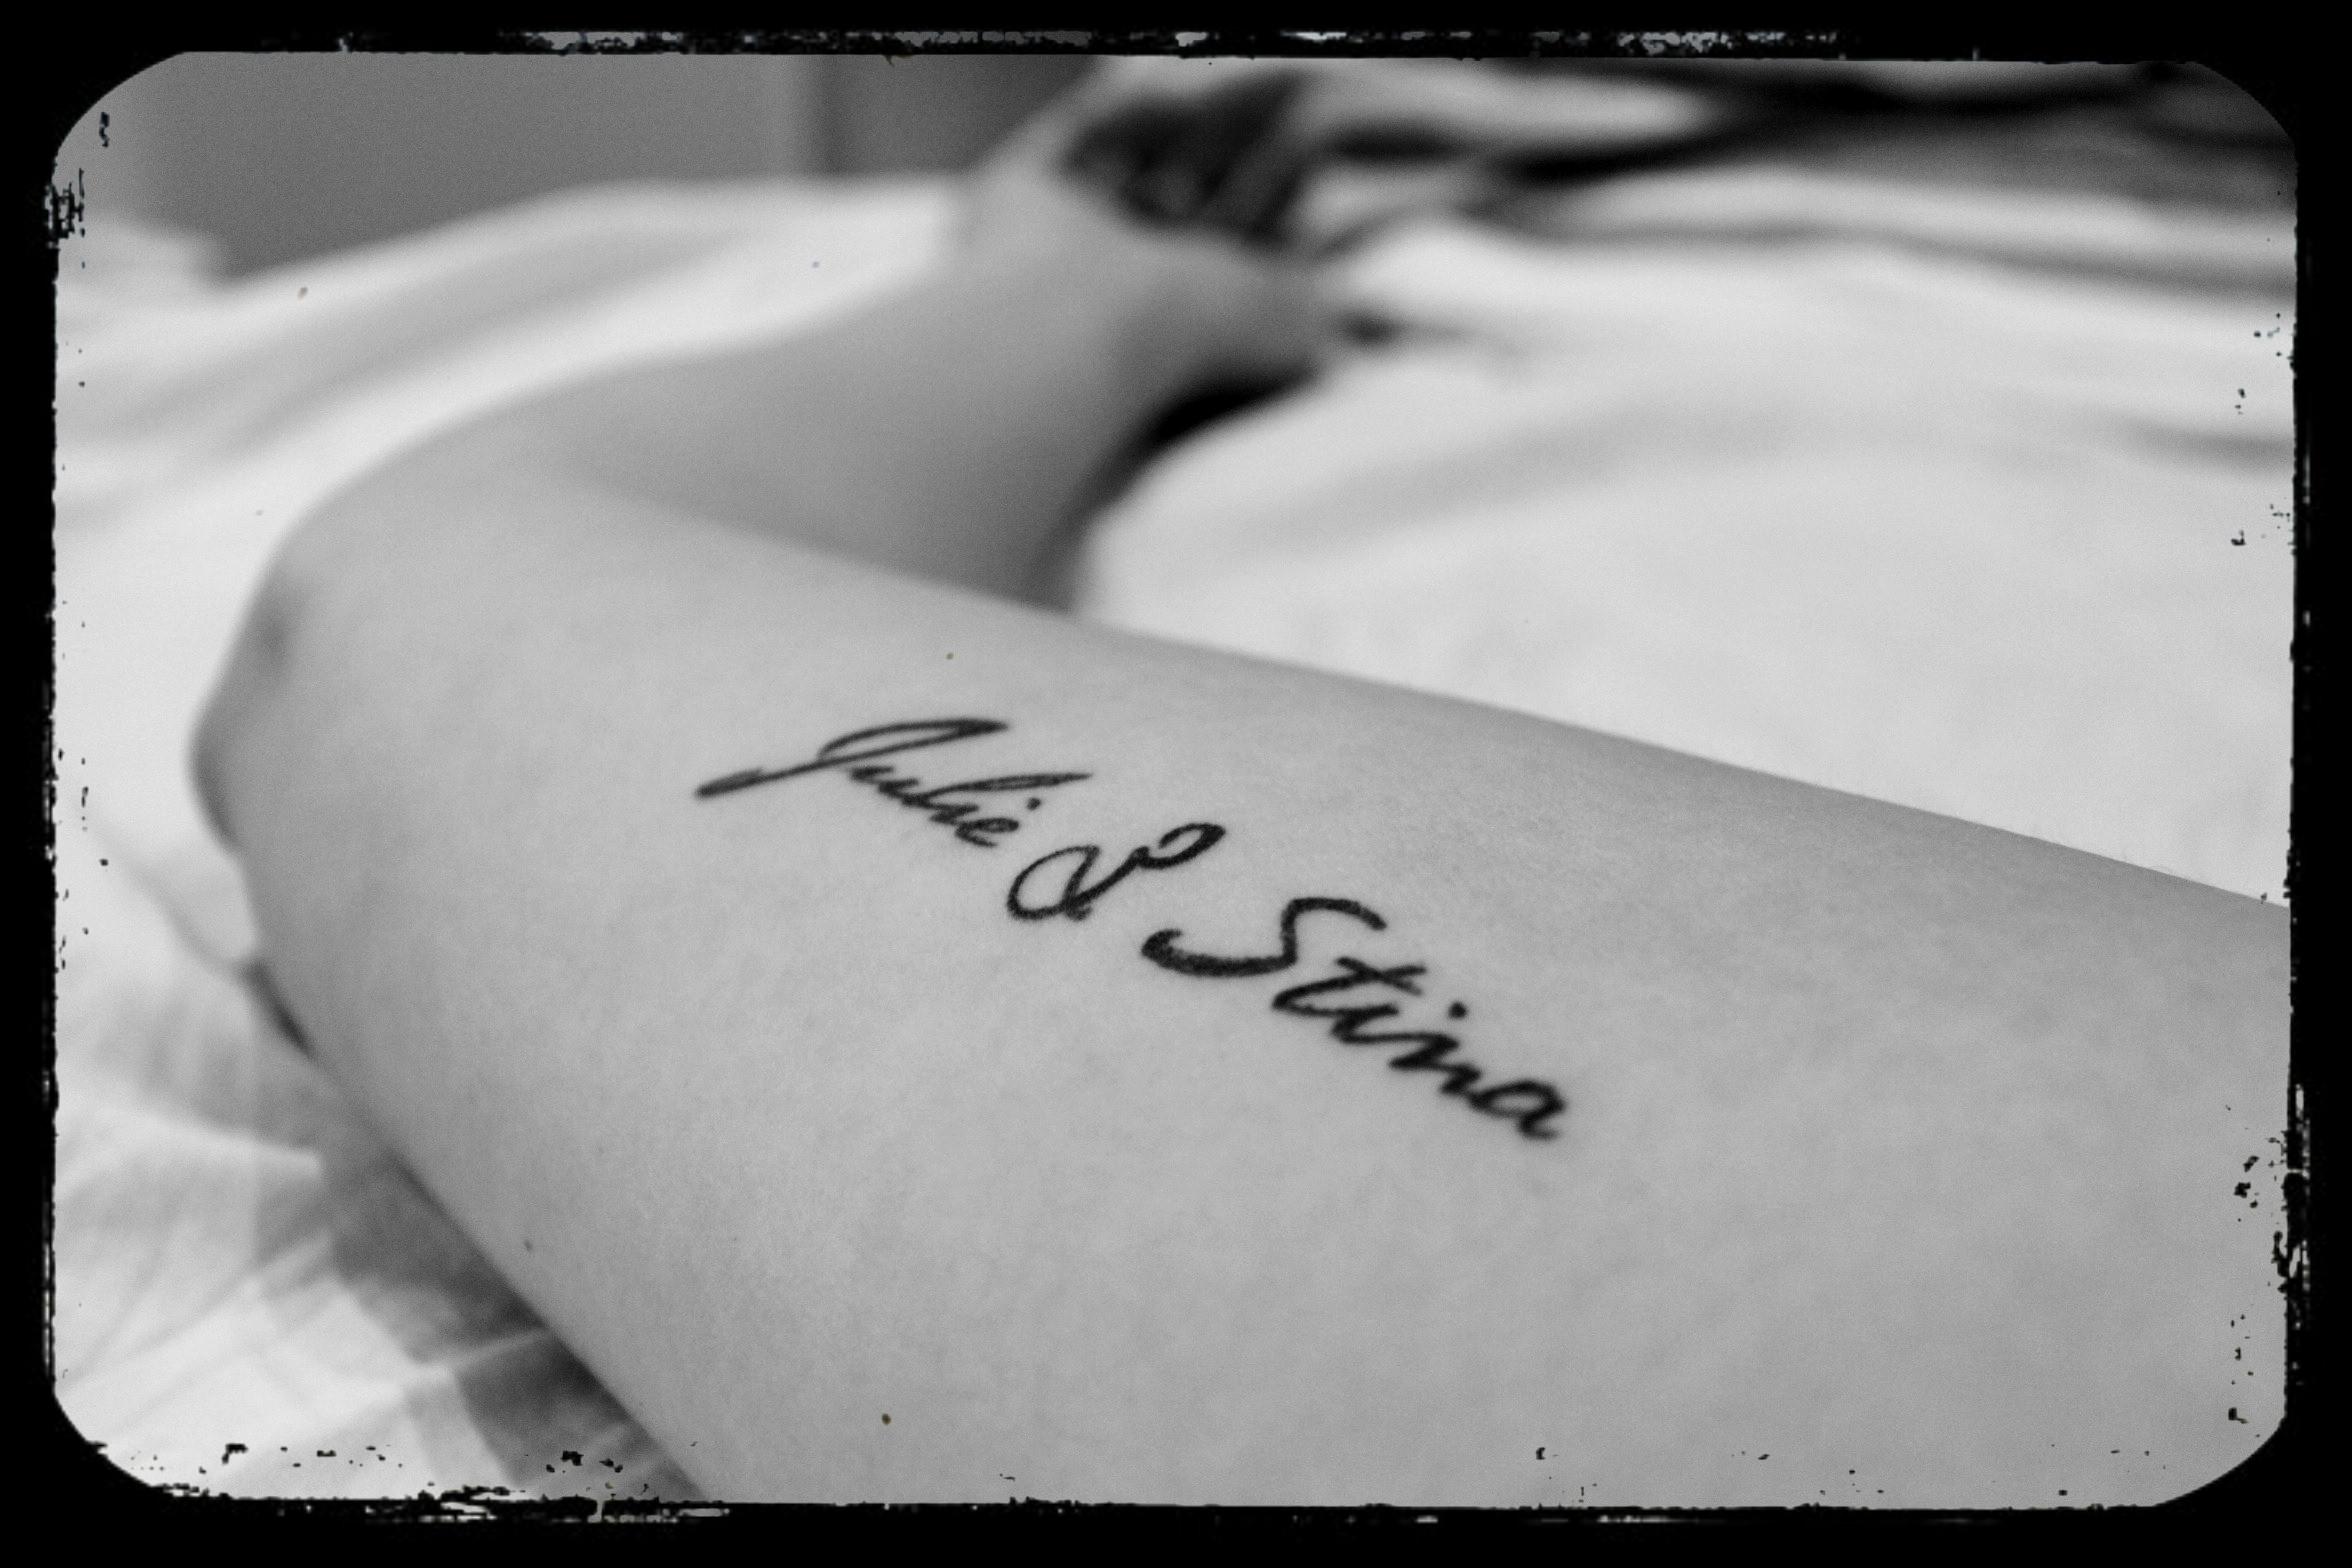 tattoo navn på arm